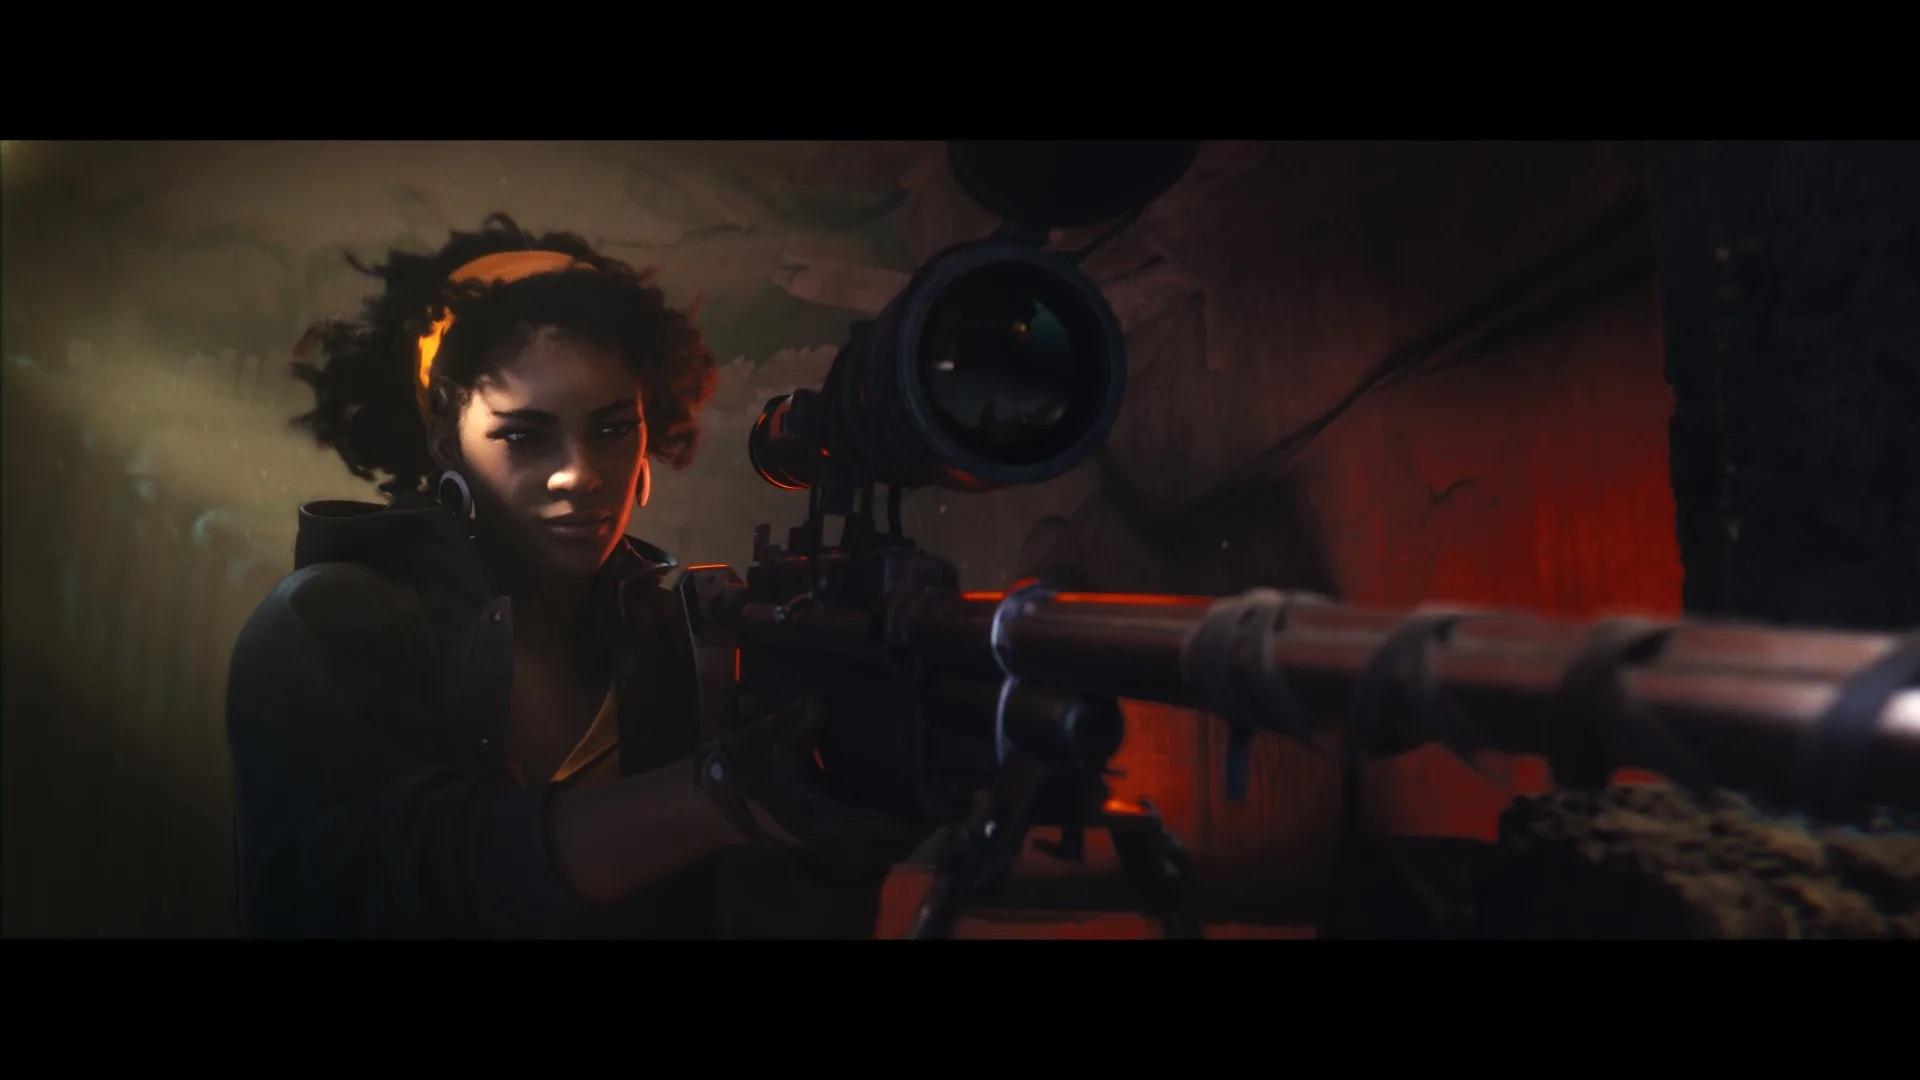 Arkane Studiosが送る新作fps Deathloop の発売時期は21年第2四半期に延期へ 開発元は 品質向上のための延期 と説明